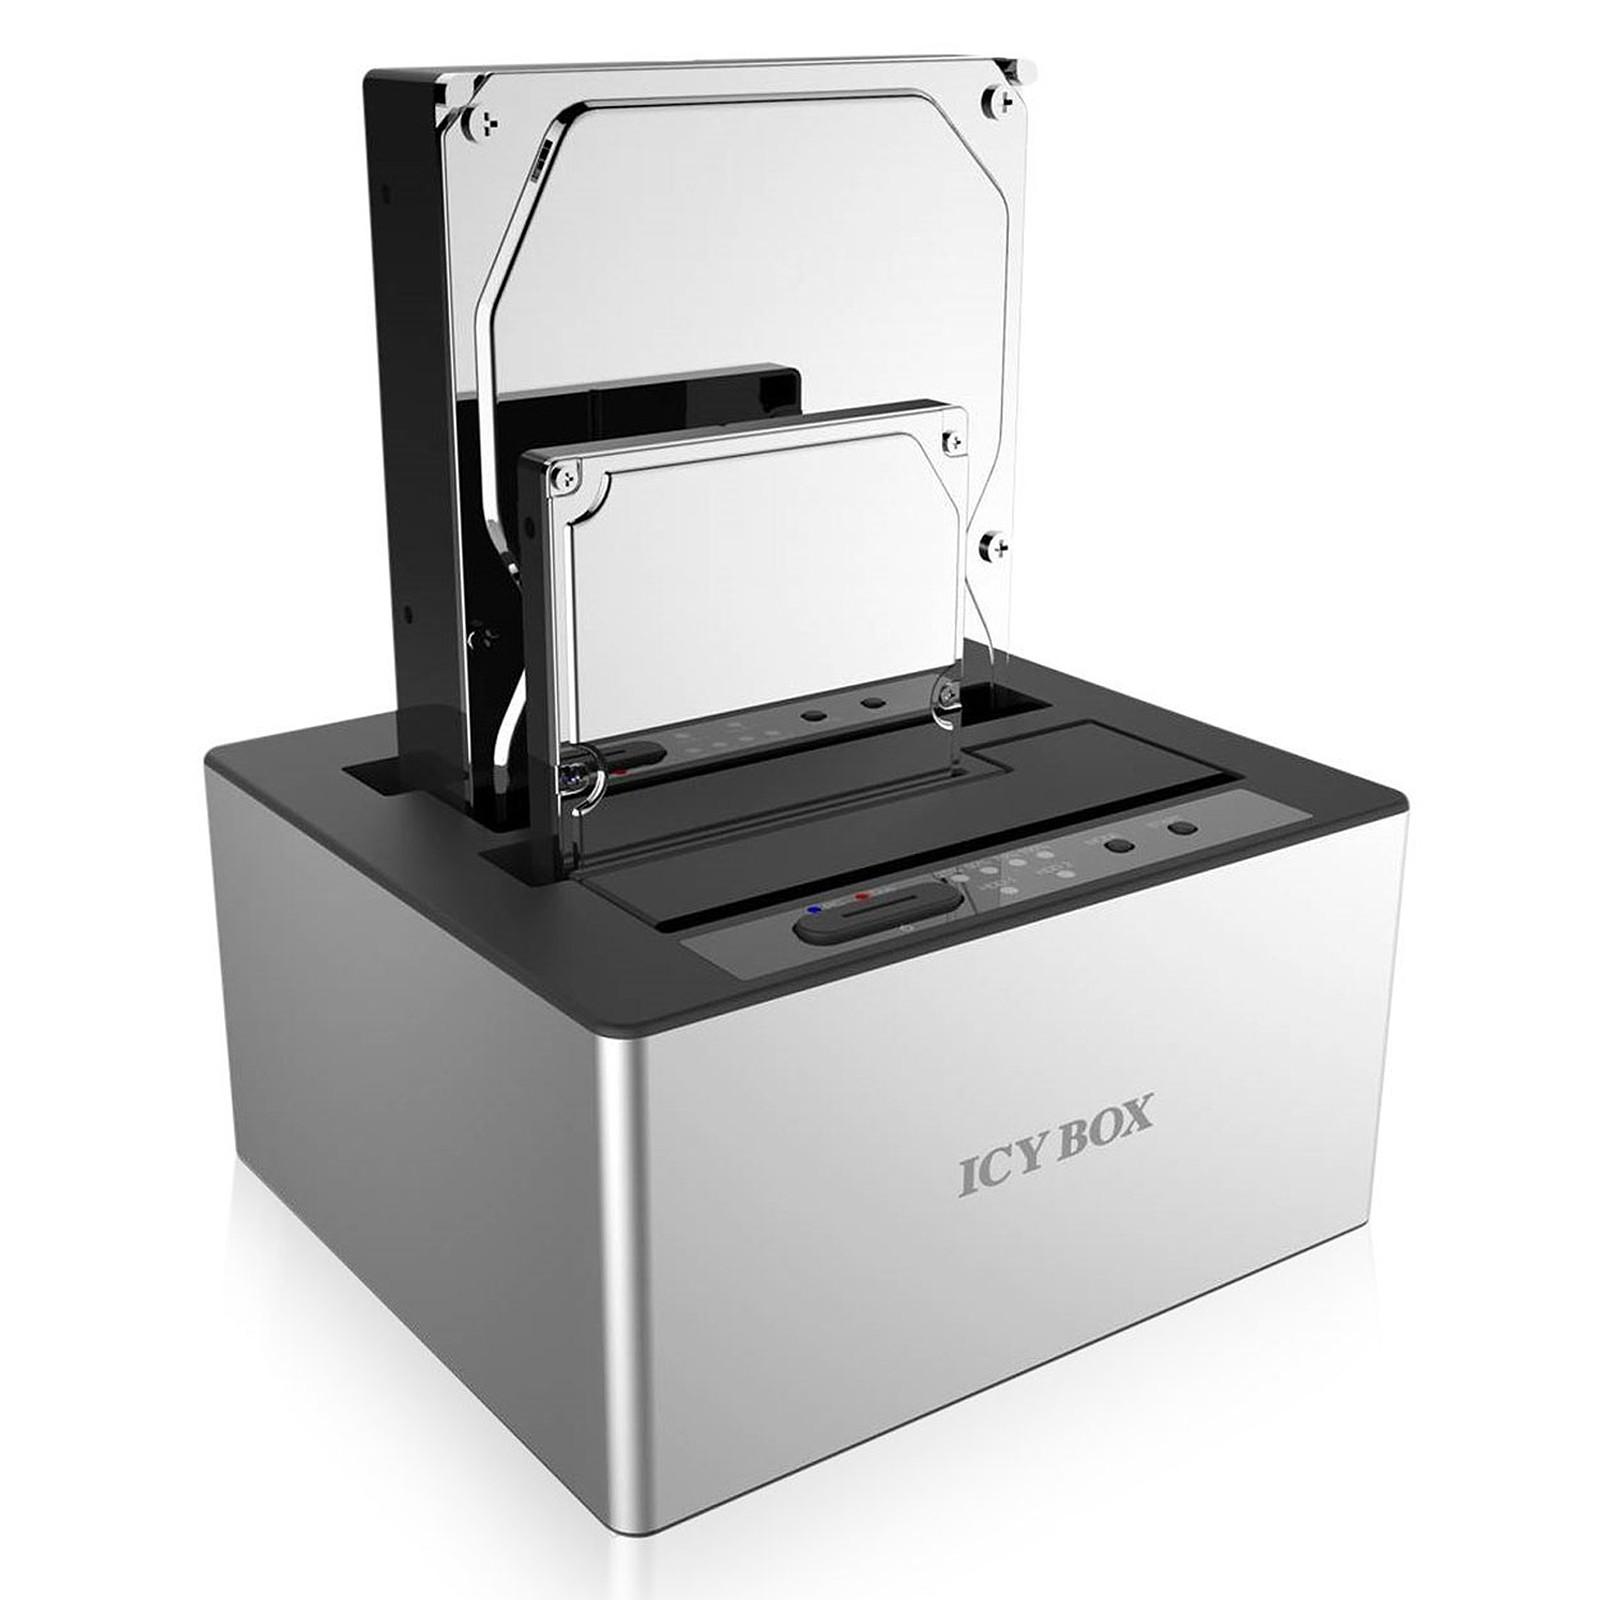 ICY BOX IB-121CL-6G